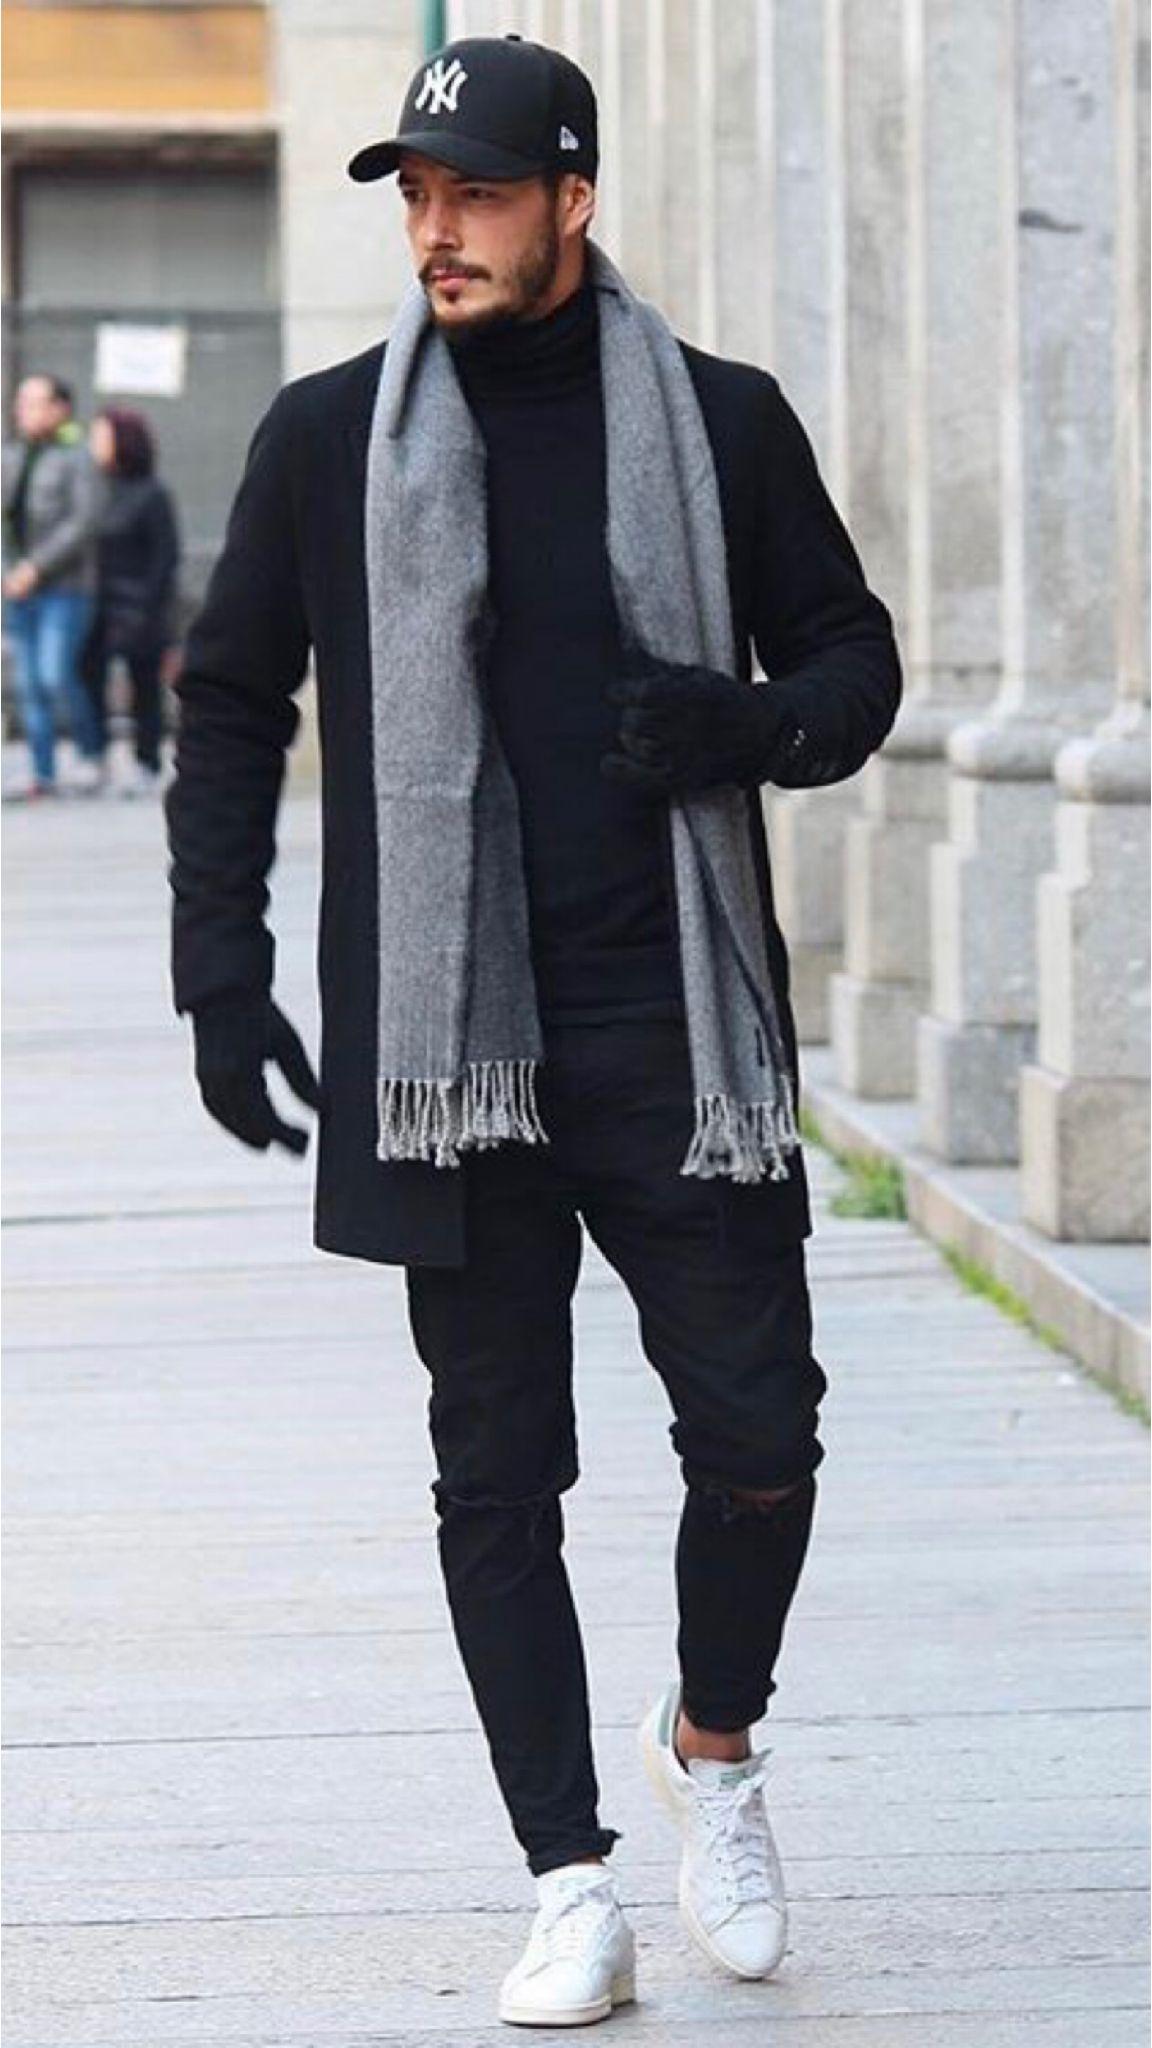 27 Really Cool Outfits Moda Hombre Invierno Estilo De Ropa Hombre Ropa Casual De Hombre